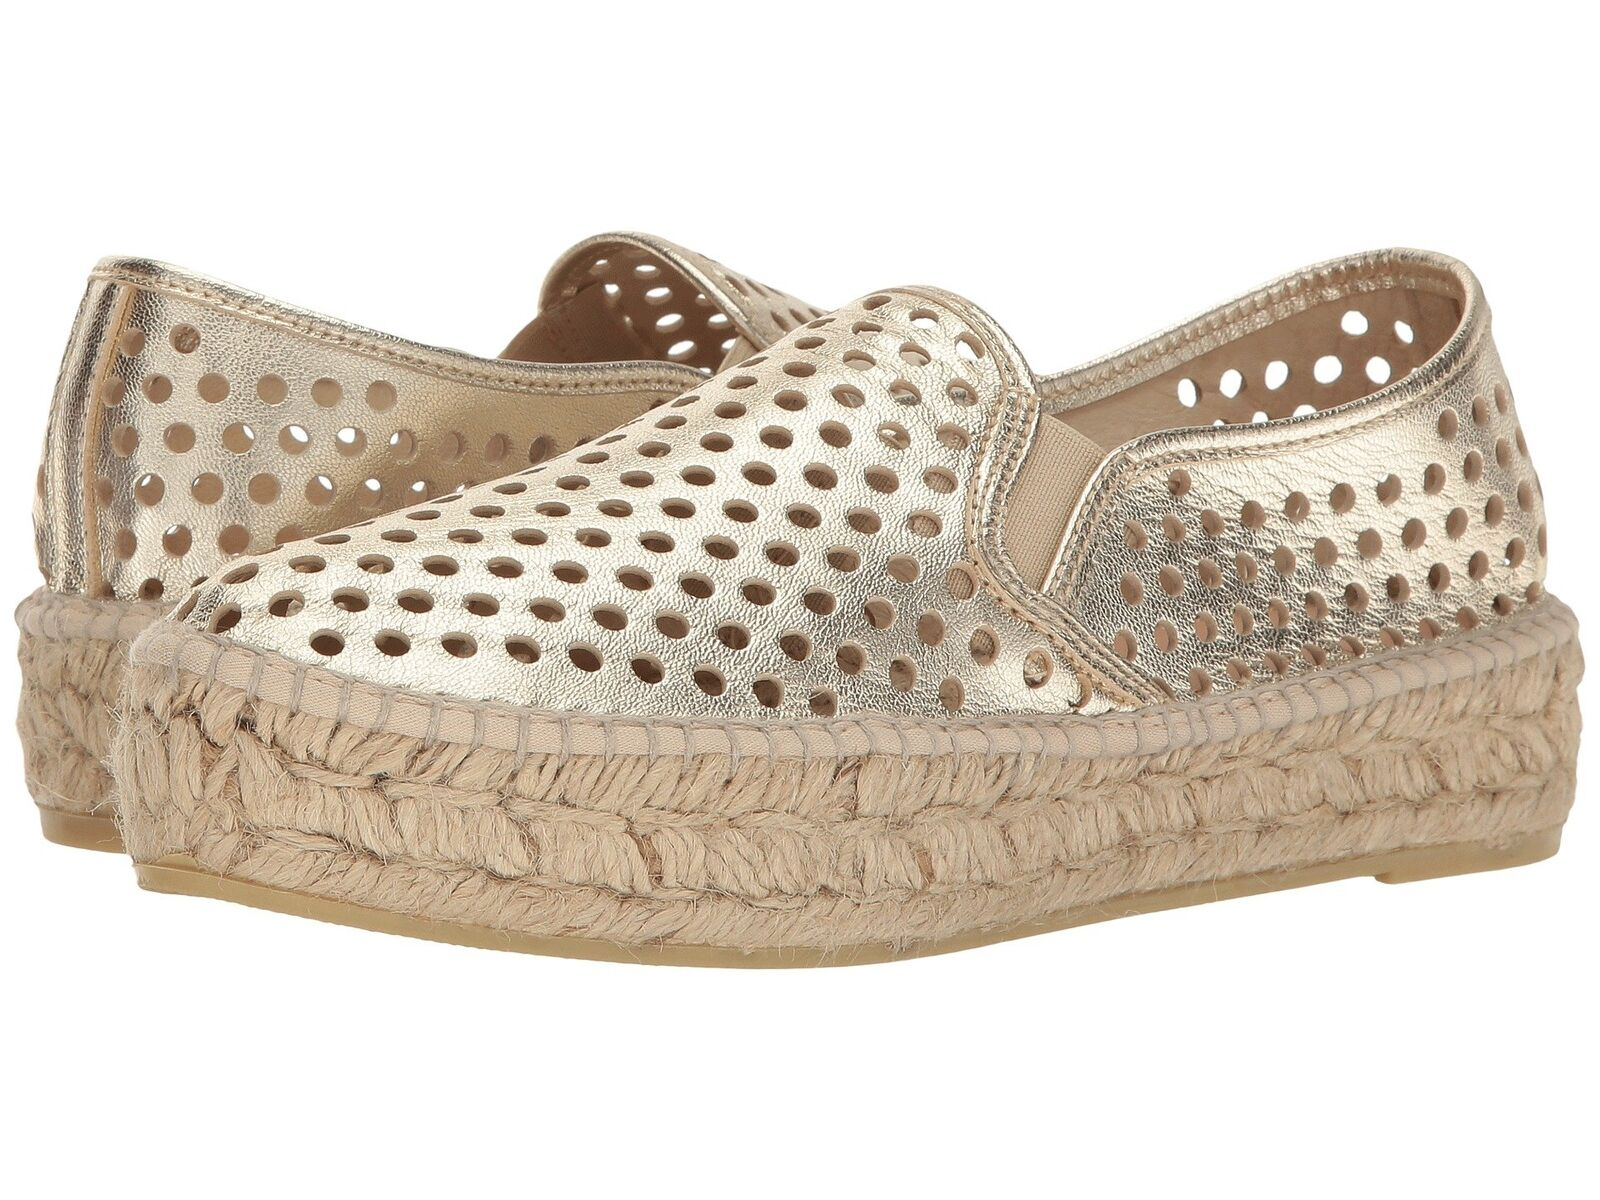 LOEFFLER RANDALL Rowan Perforated Leather gold Slip On Sneakers 40 10 NWOB  225